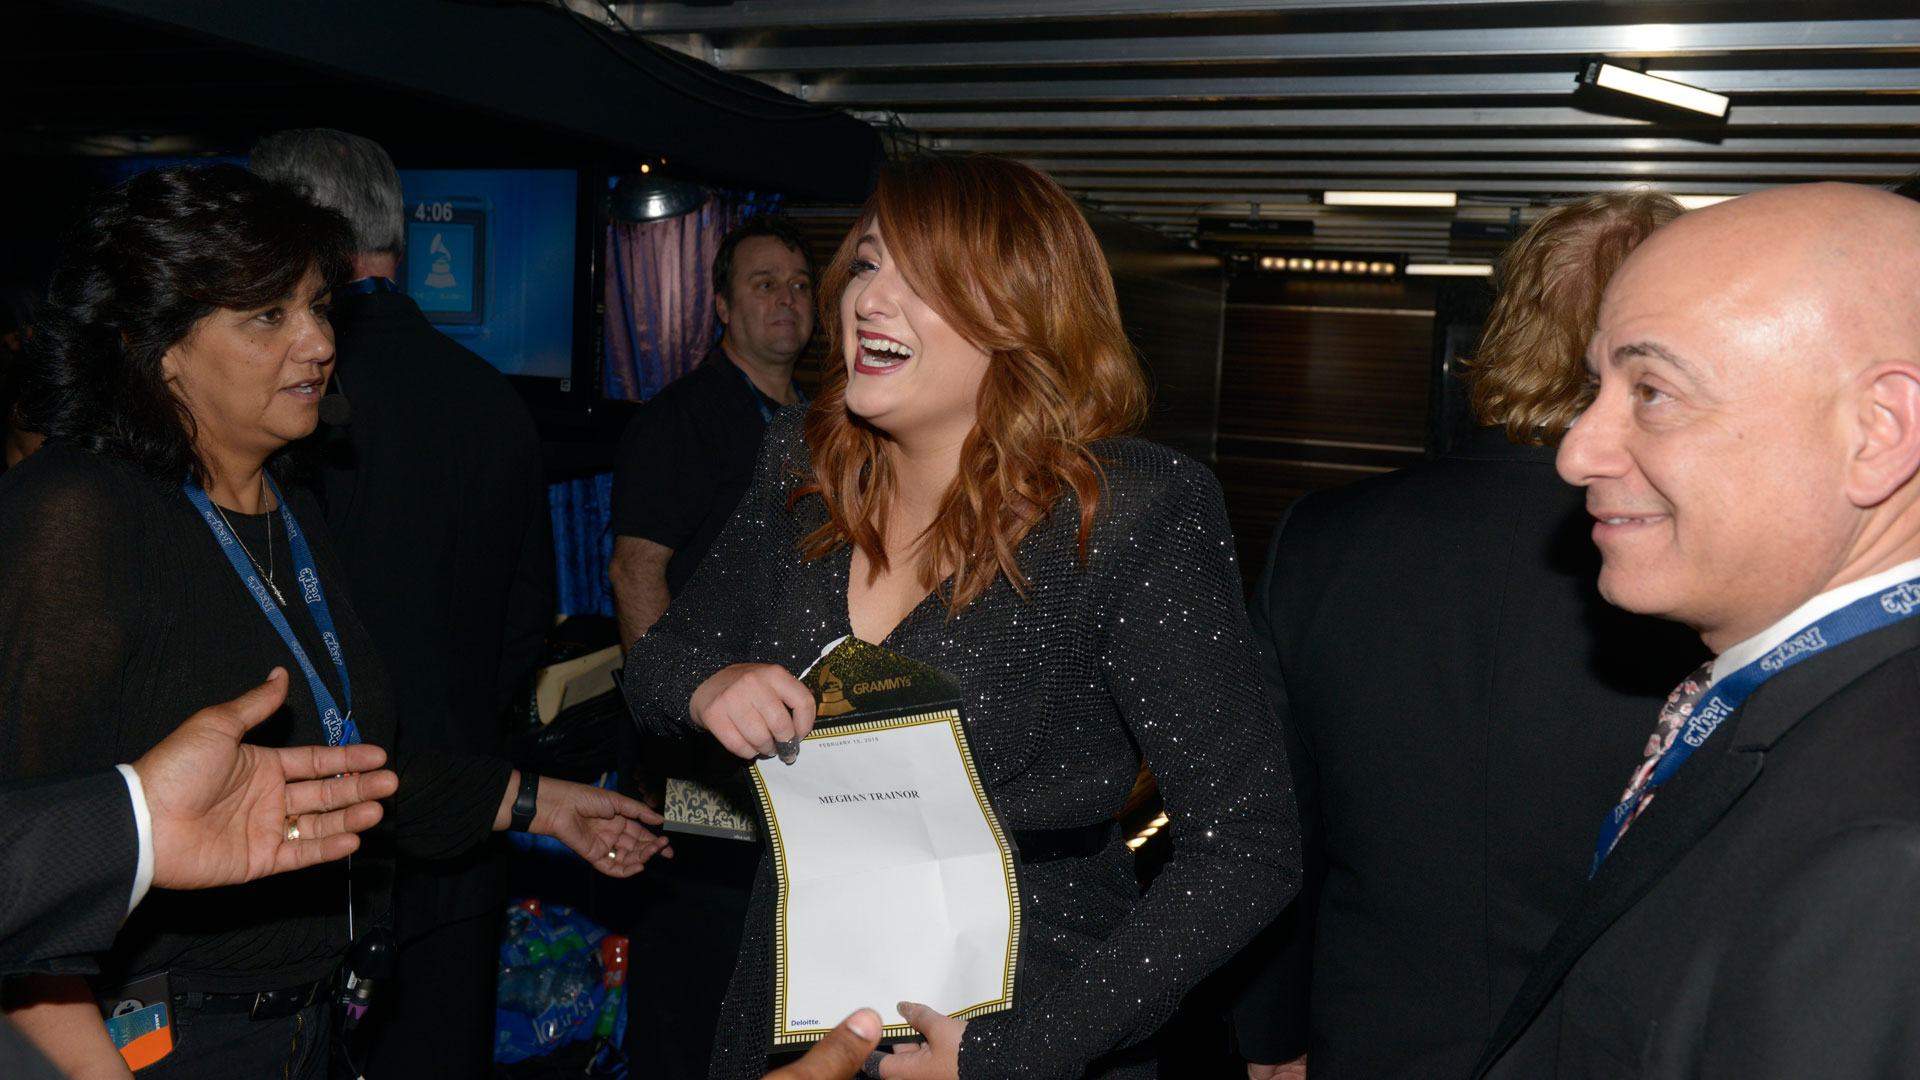 Meghan Trainor cries tears of joy after her Best New Artist GRAMMY win